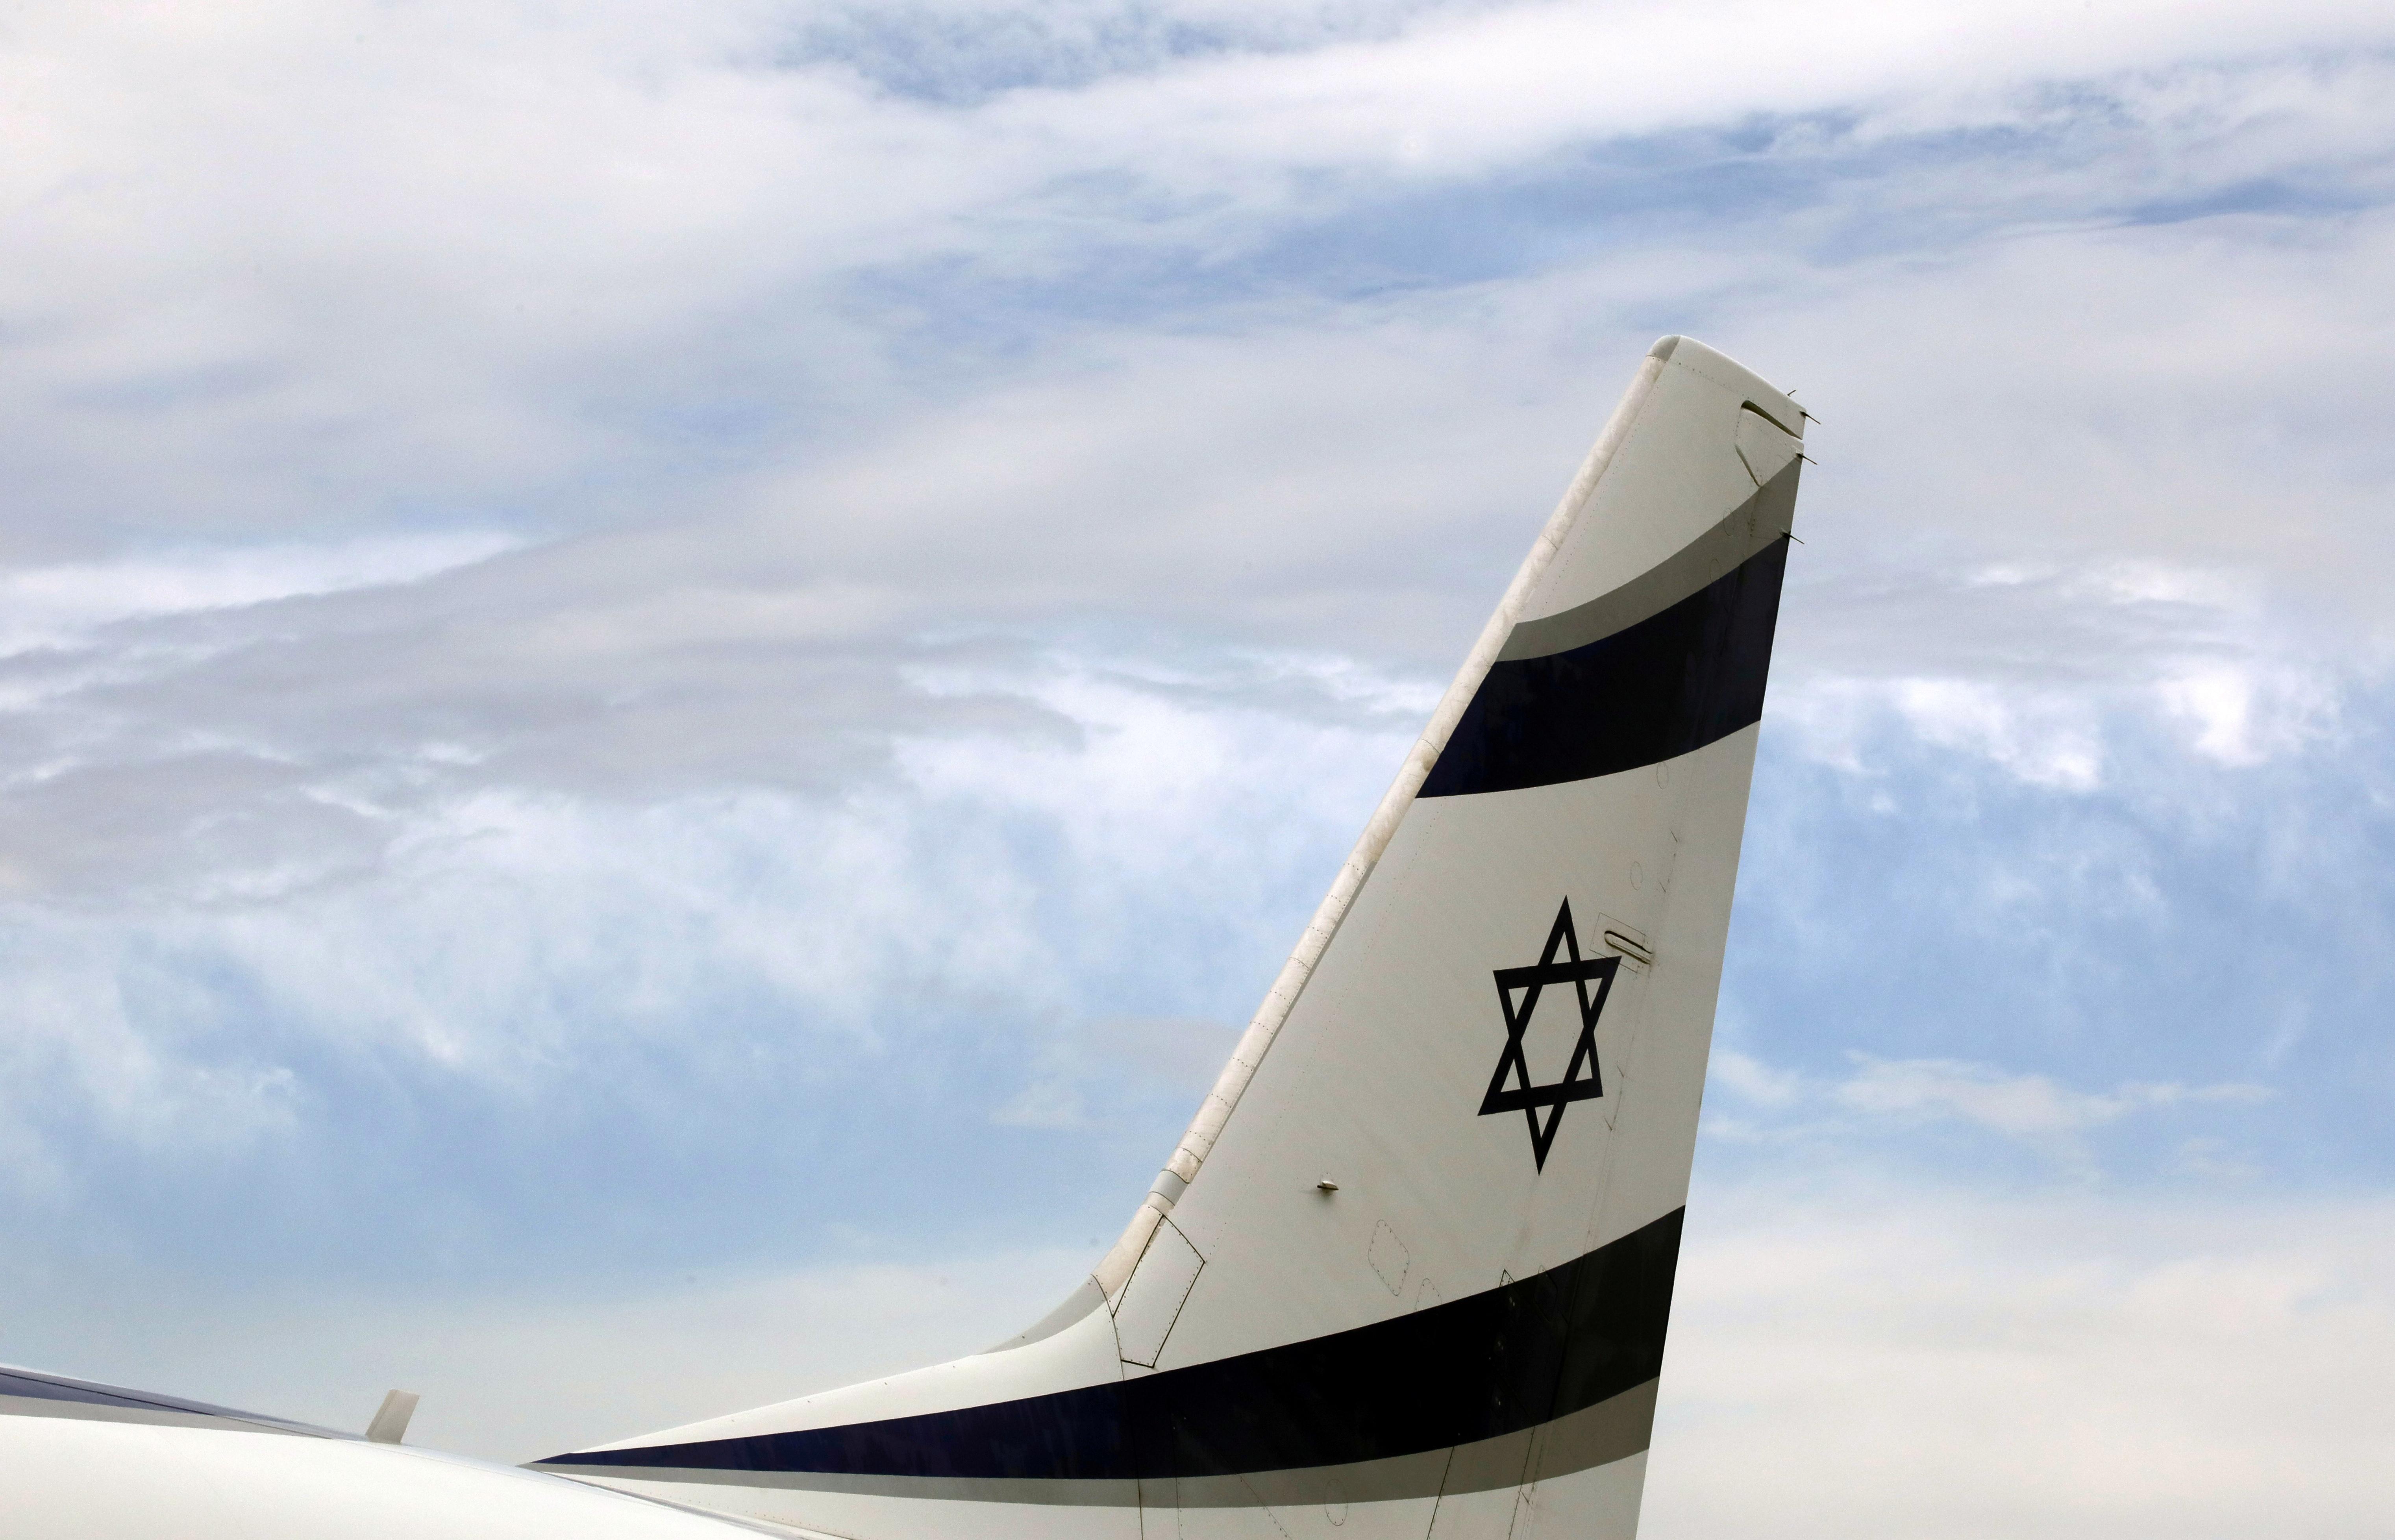 An Israel El Al airlines plane is seen after its landing following its inaugural flight between Tel Aviv and Nice at Nice international airport, France, April 4, 2019.    REUTERS/Eric Gaillard/File Photo